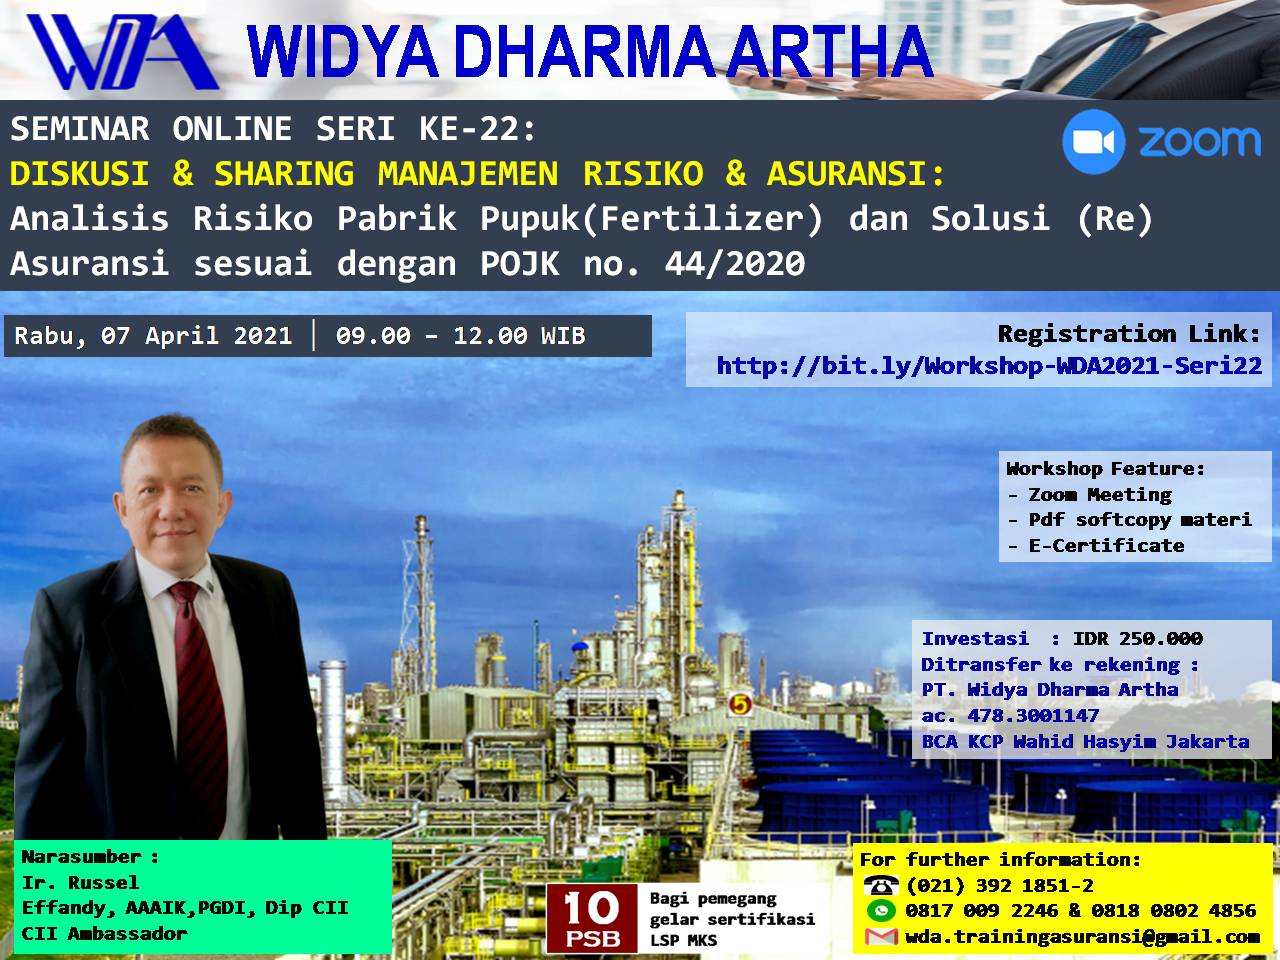 wda-pabrik-pupuk-070421